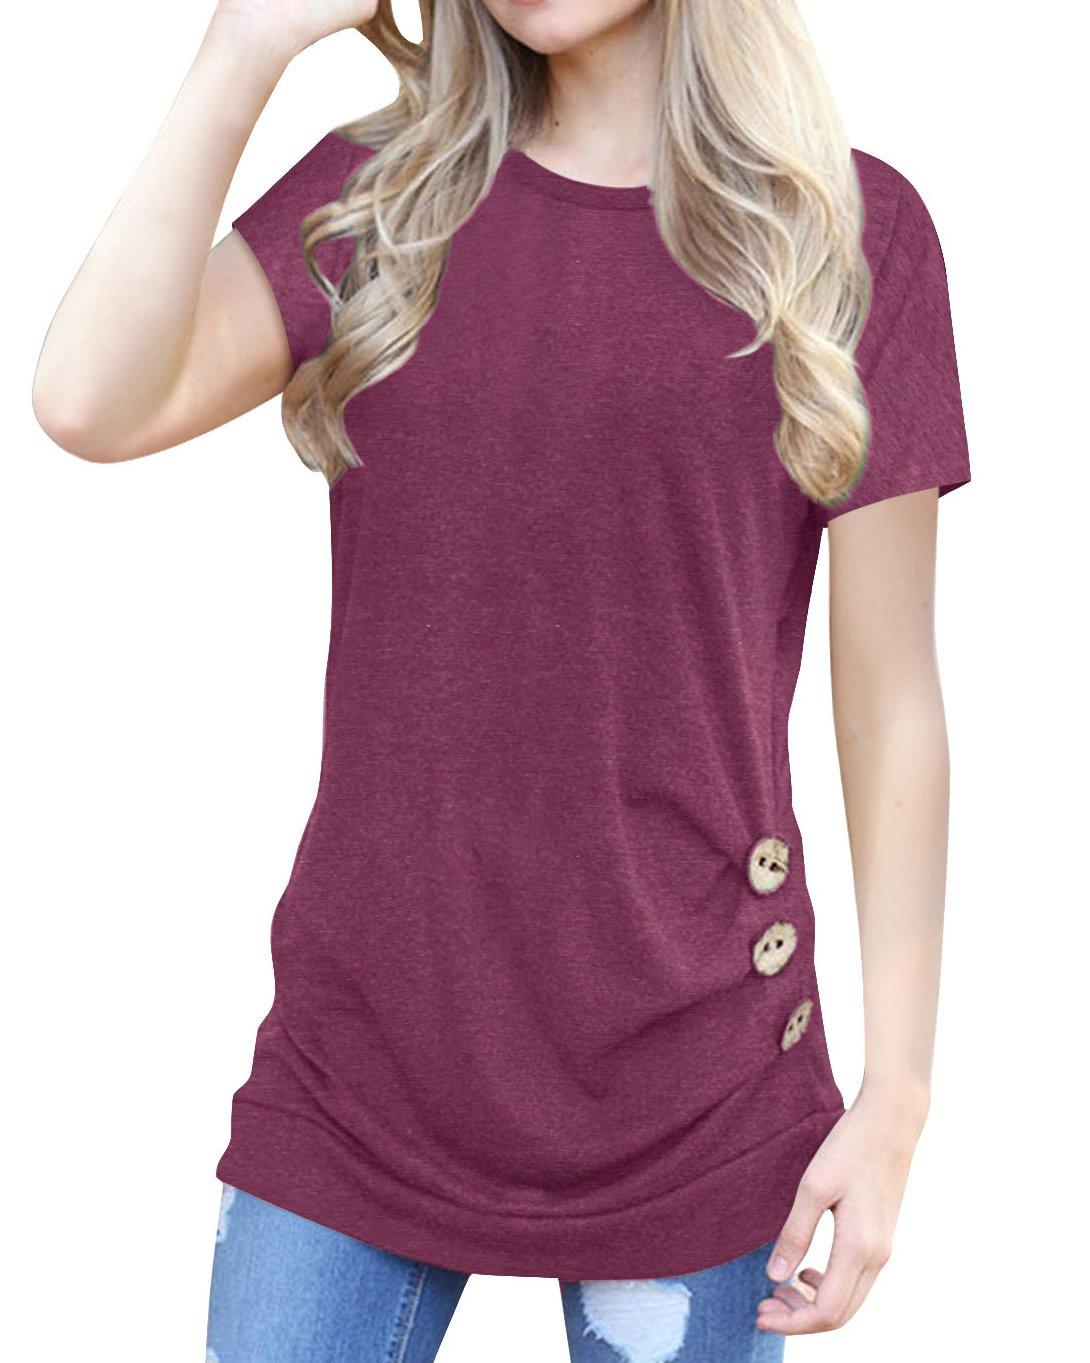 Women's Casual Short Sleeve Tunic Top Sweatshirt Blouse Button Decor T-Shirt Wine Red XL